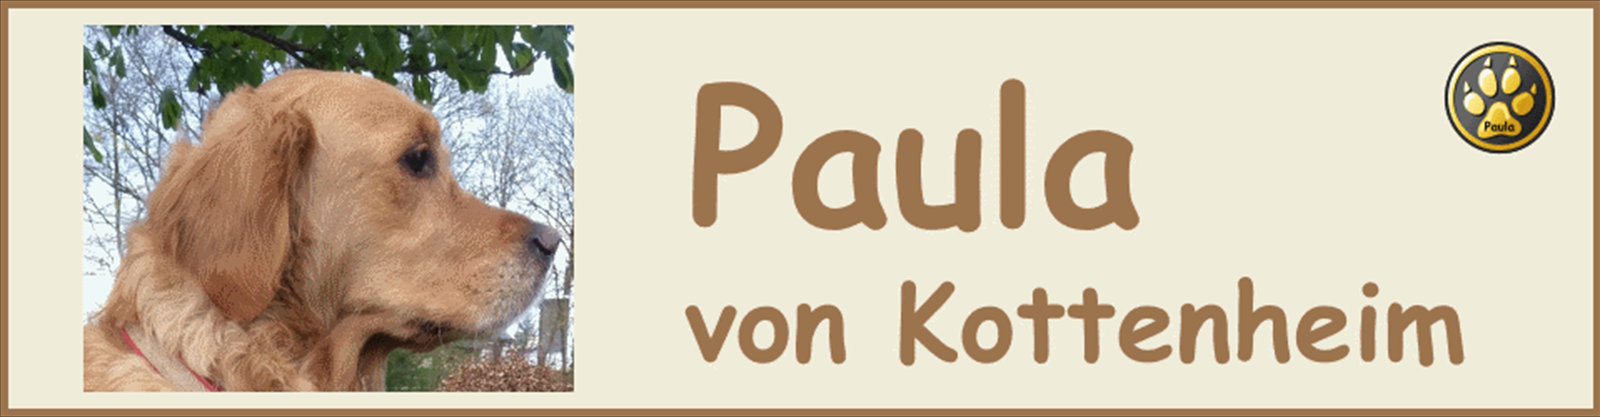 Paula-Banner-13